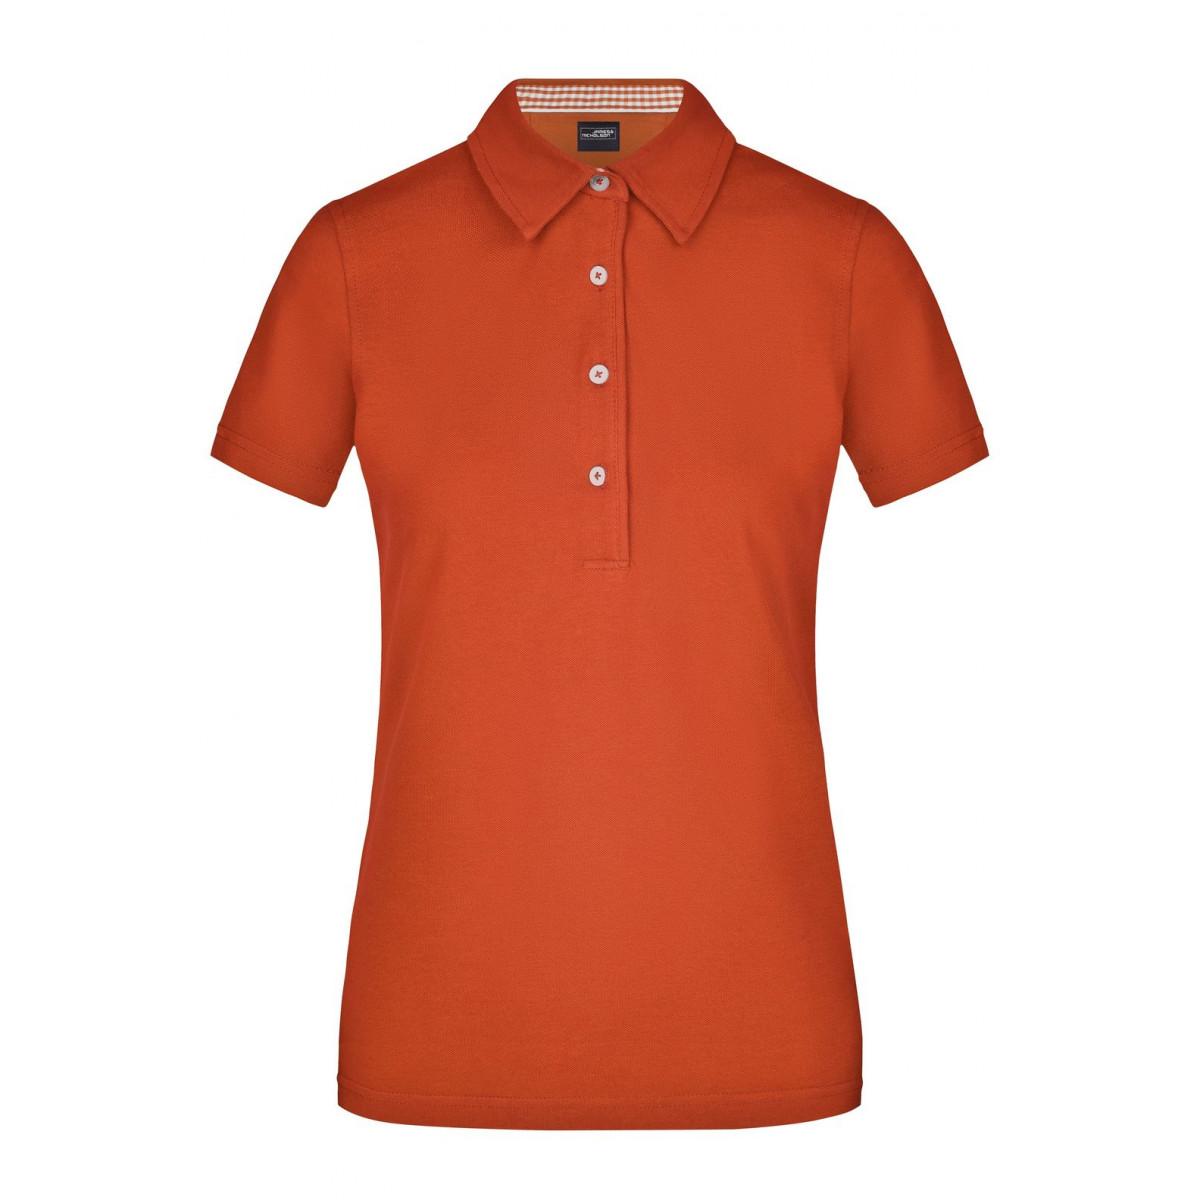 Рубашка поло женская JN969 Ladies Plain Polo - Темно-оранжевый/Темно-оранжевый/Белый